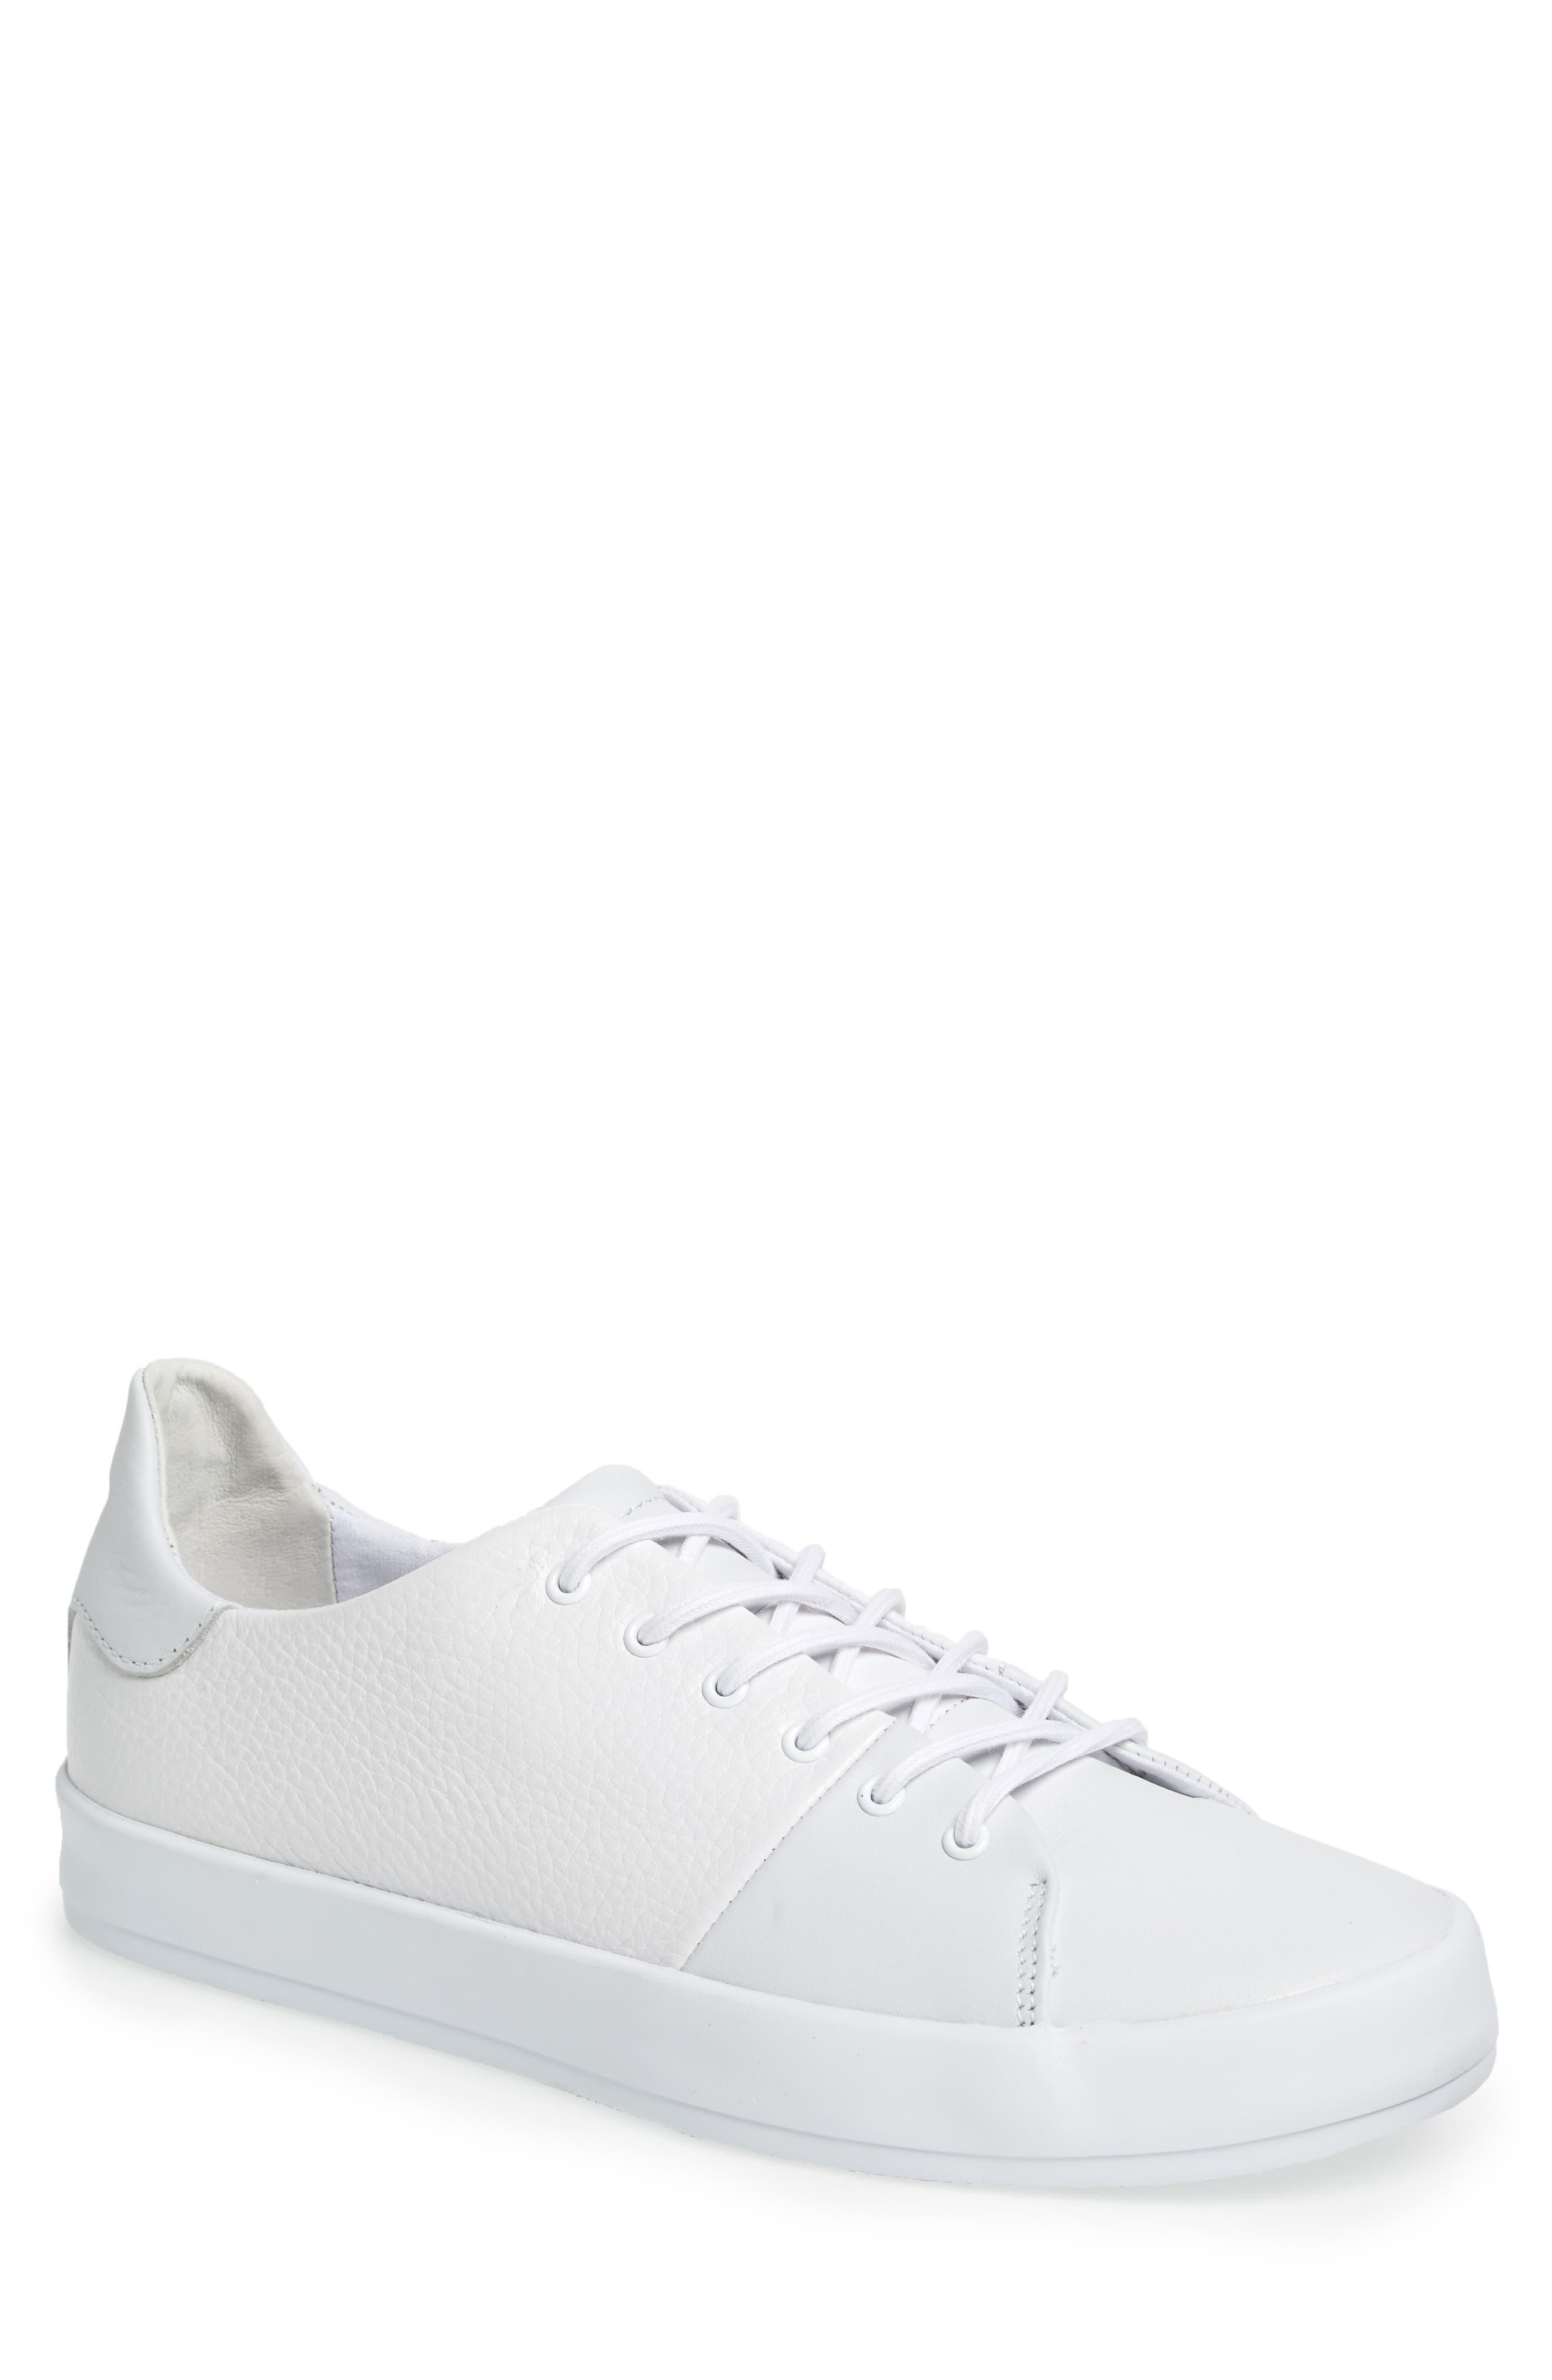 Creative Recreation Carda Low Sneaker (Men)